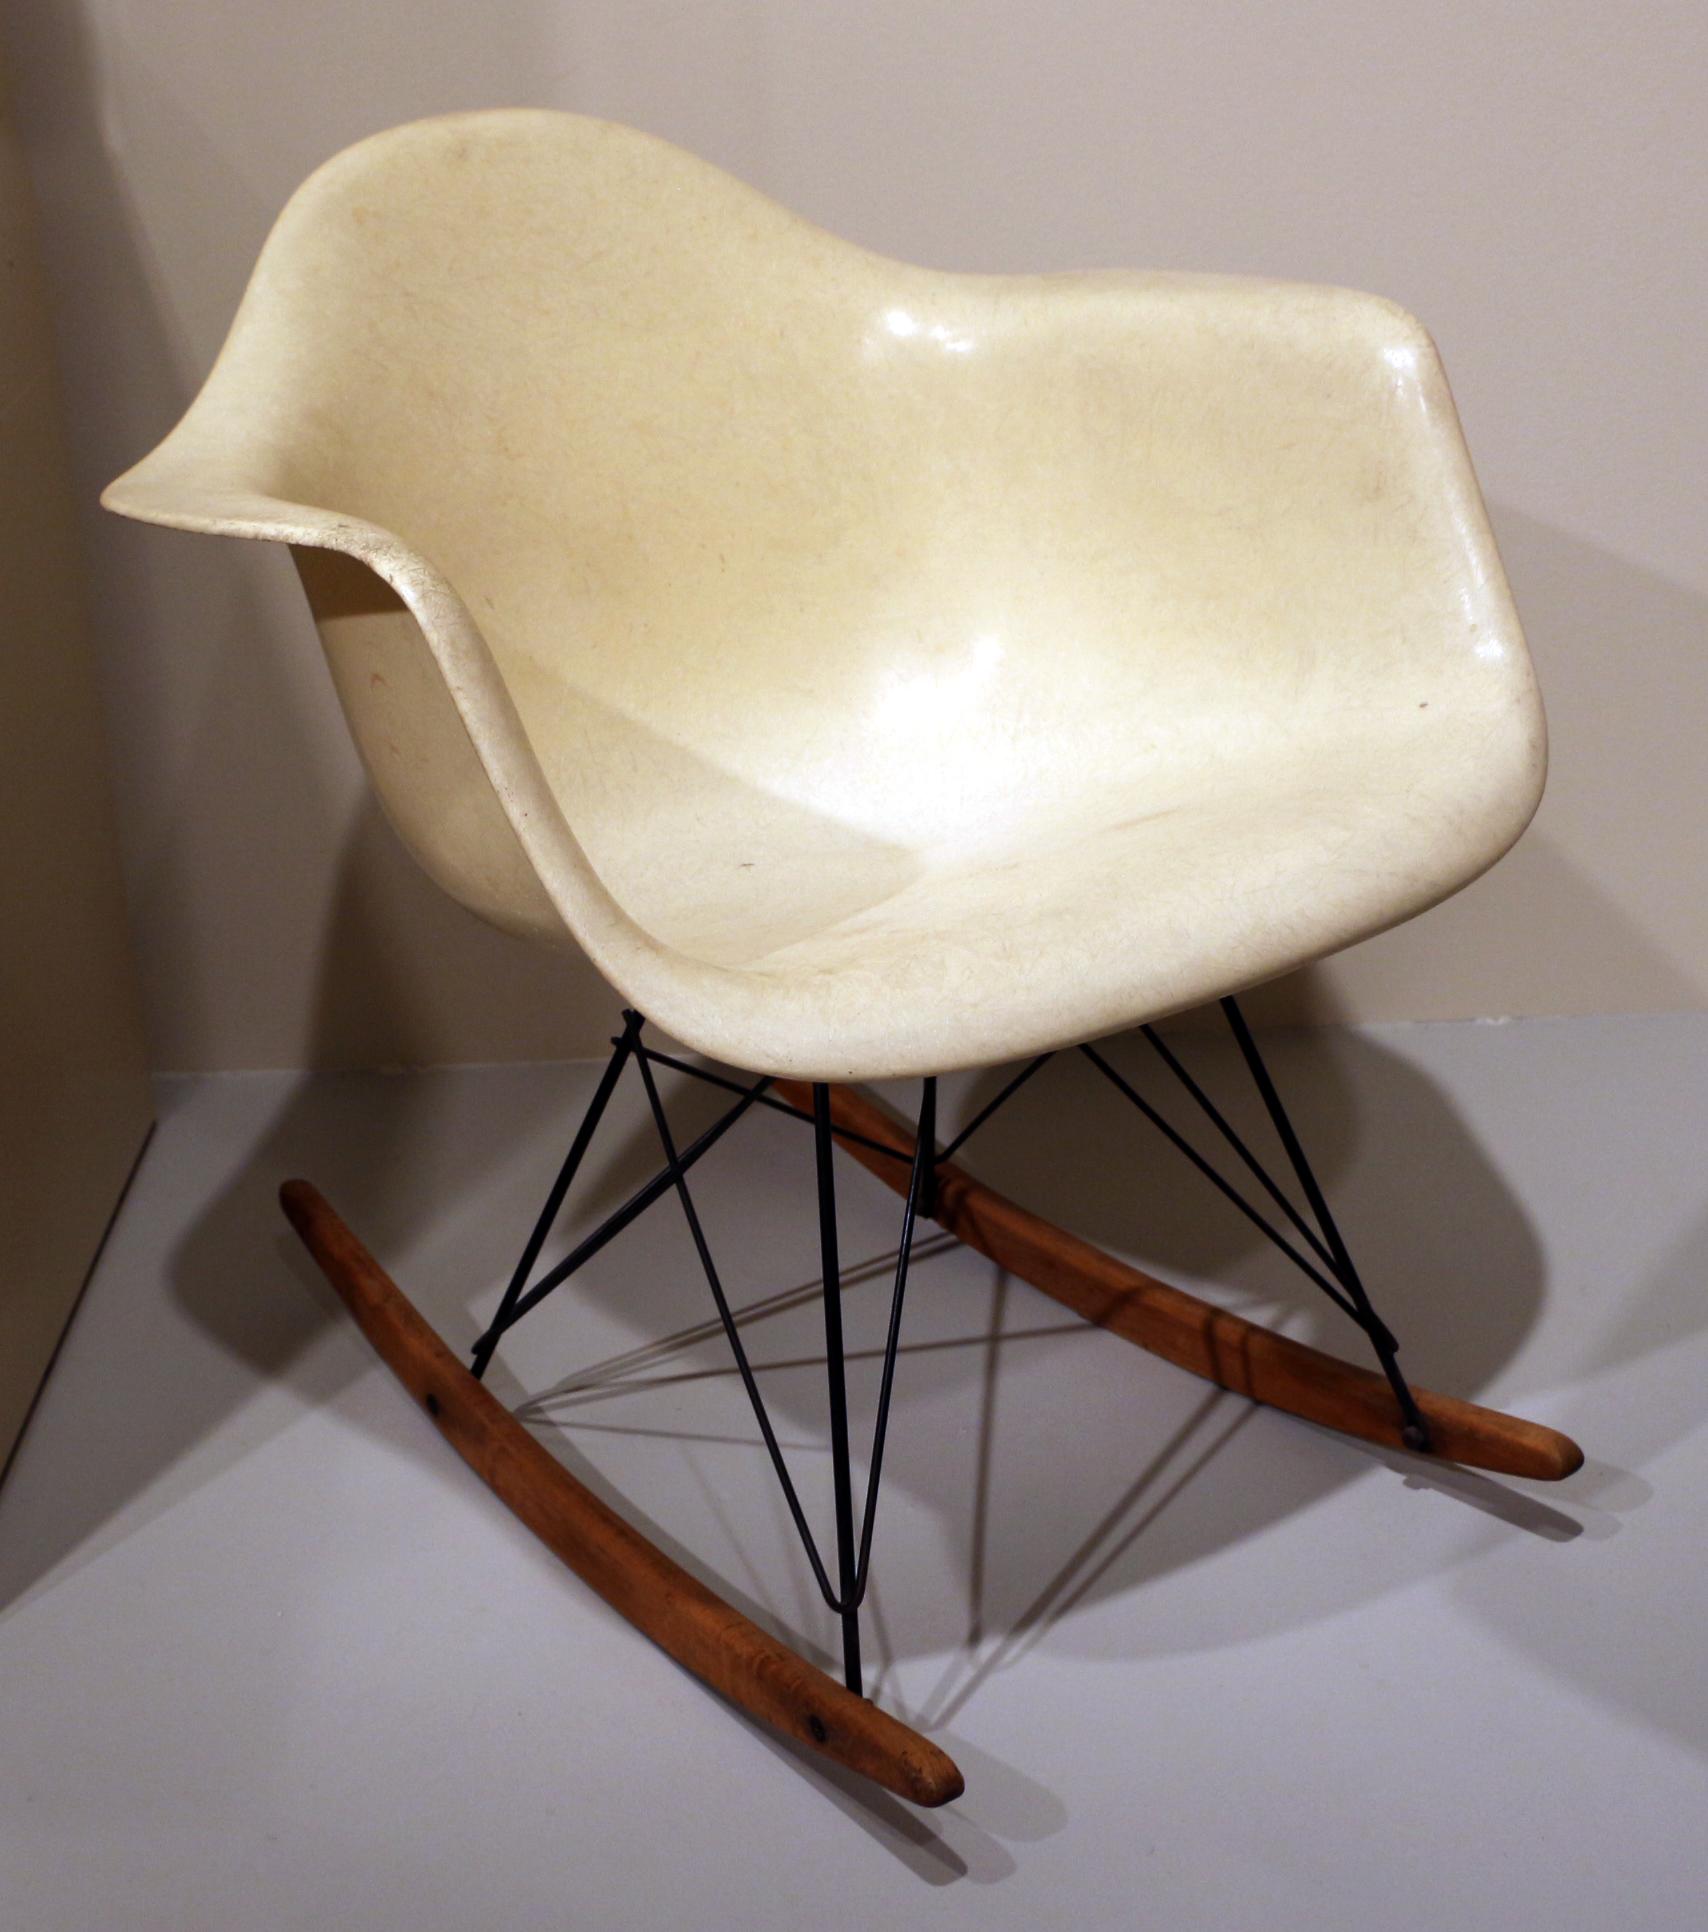 Sedia Dondolo Eames.File Charles E Ray Eames Per Herman Miller Inc Tramite